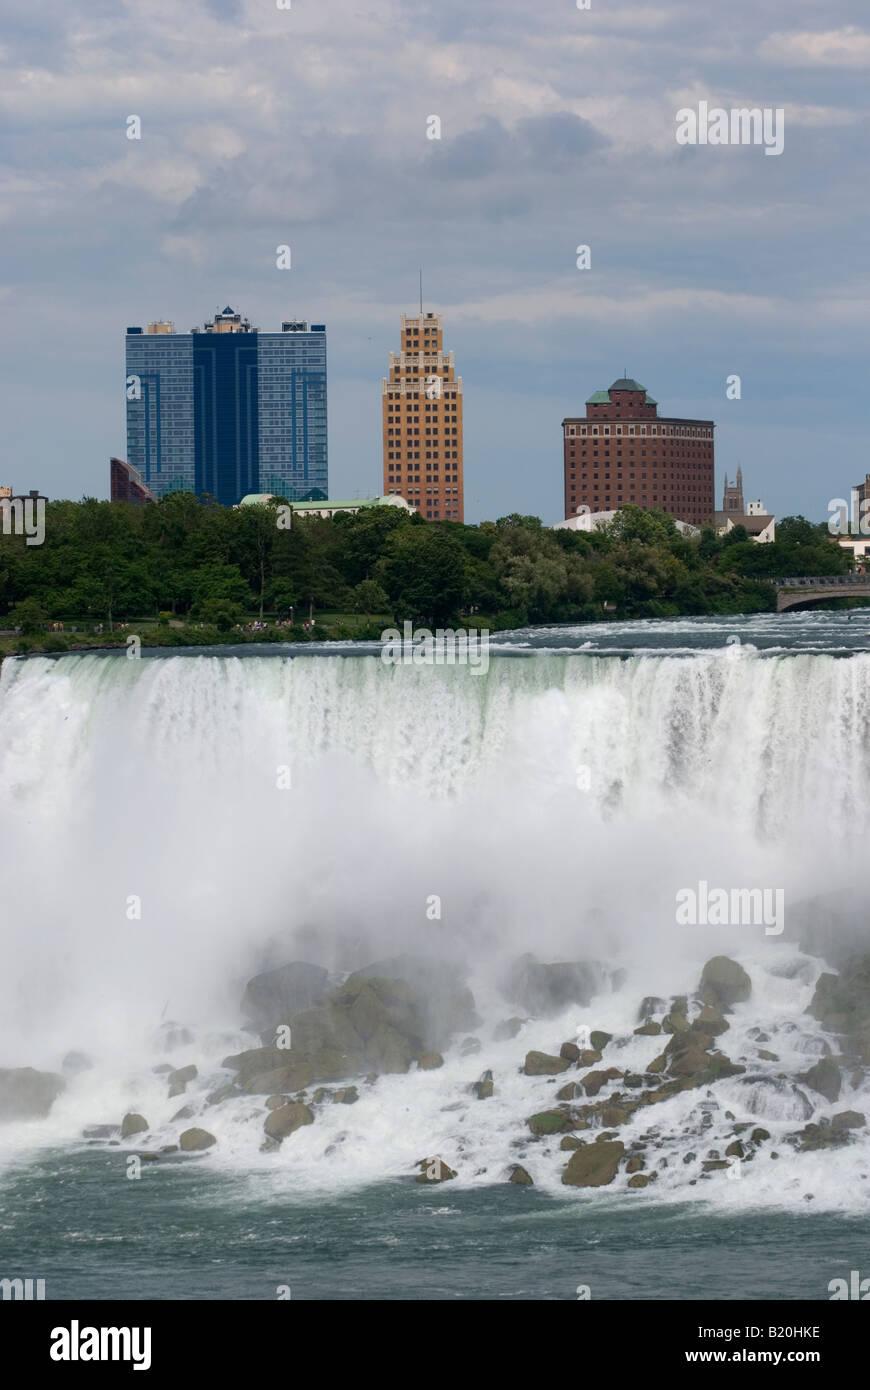 Seneca Niagara Casino And Hotel Niagara Falls New York Usa Stock Photo Alamy